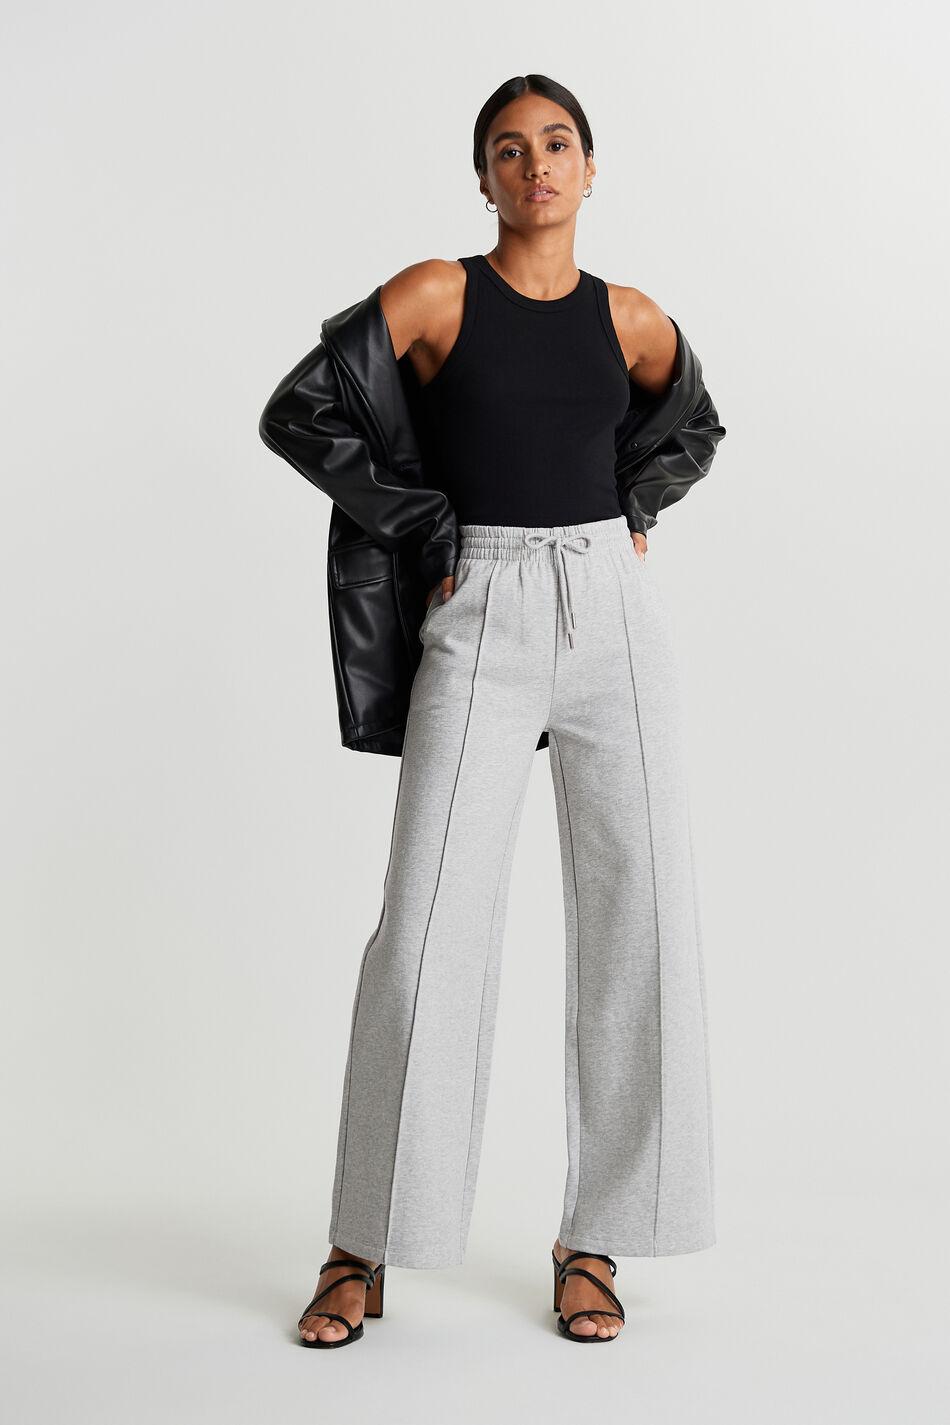 Gina Tricot Bonnie sweatpants S Female Grey melange (8181)